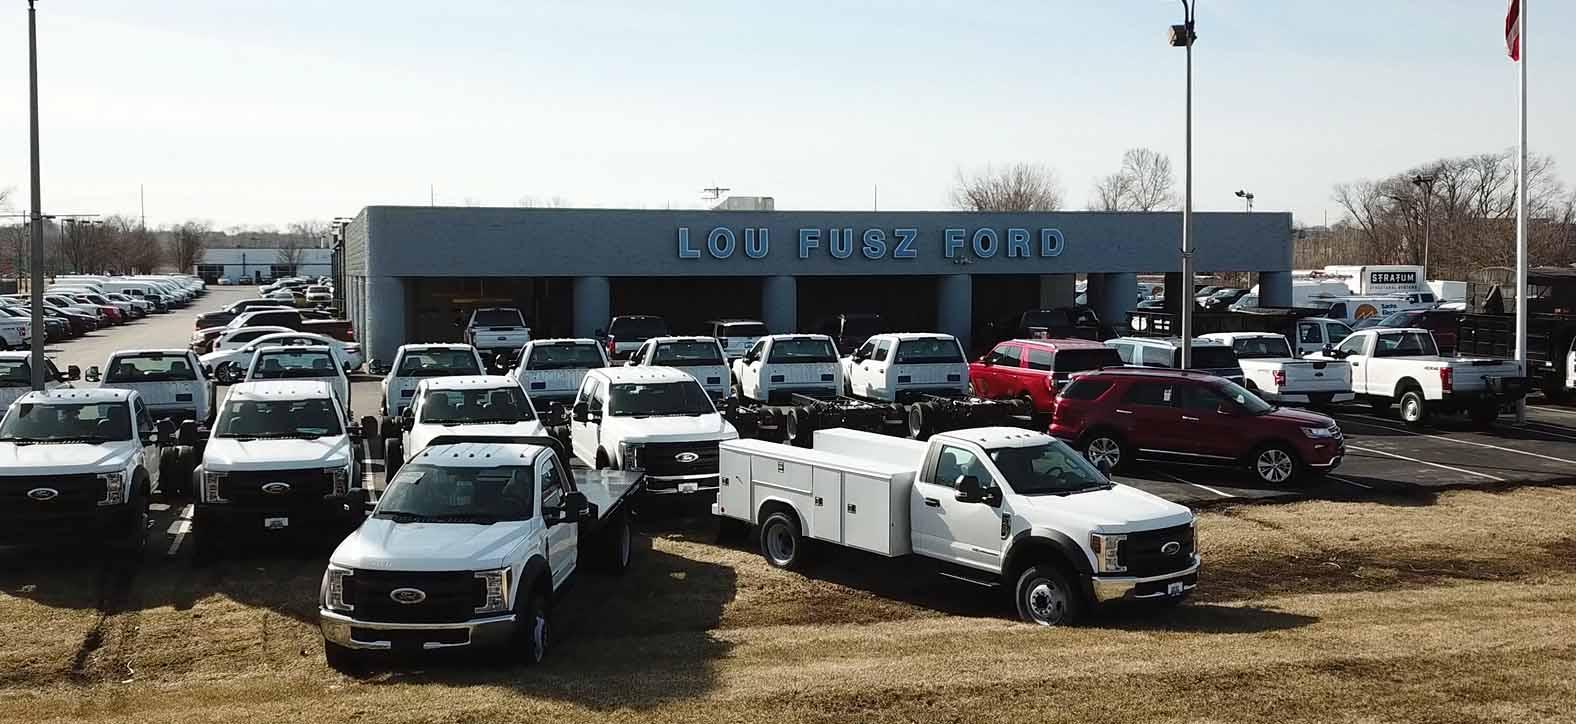 Lou Fusz Ford >> Ford Service Center Lou Fusz Ford